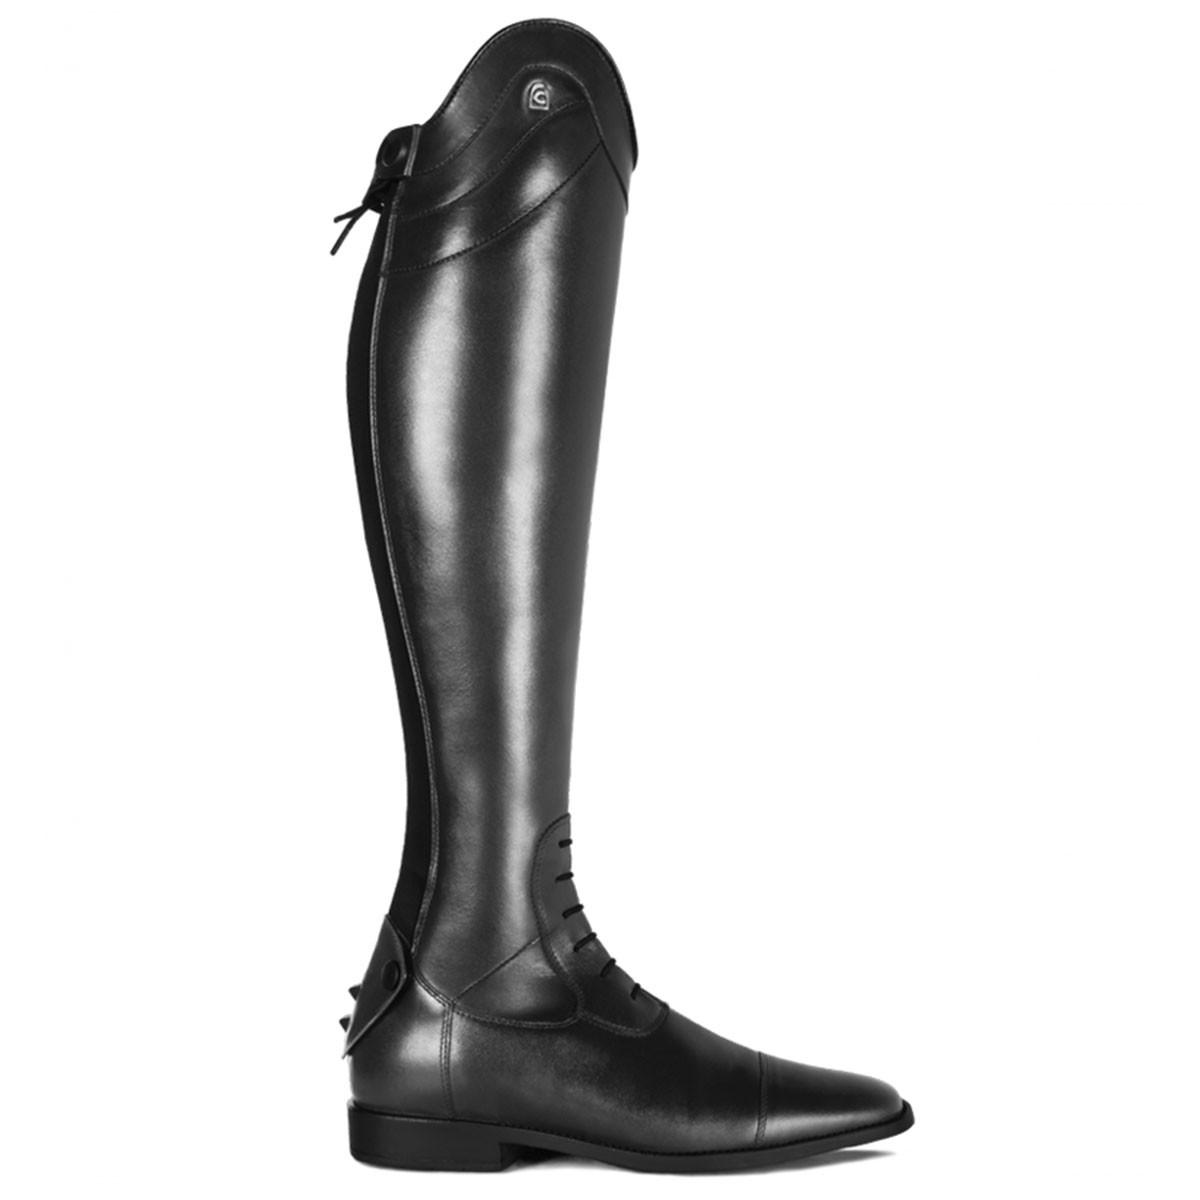 Cavallo Linus Slim rijlaars zwart maat:7-7.5 / h48-w35